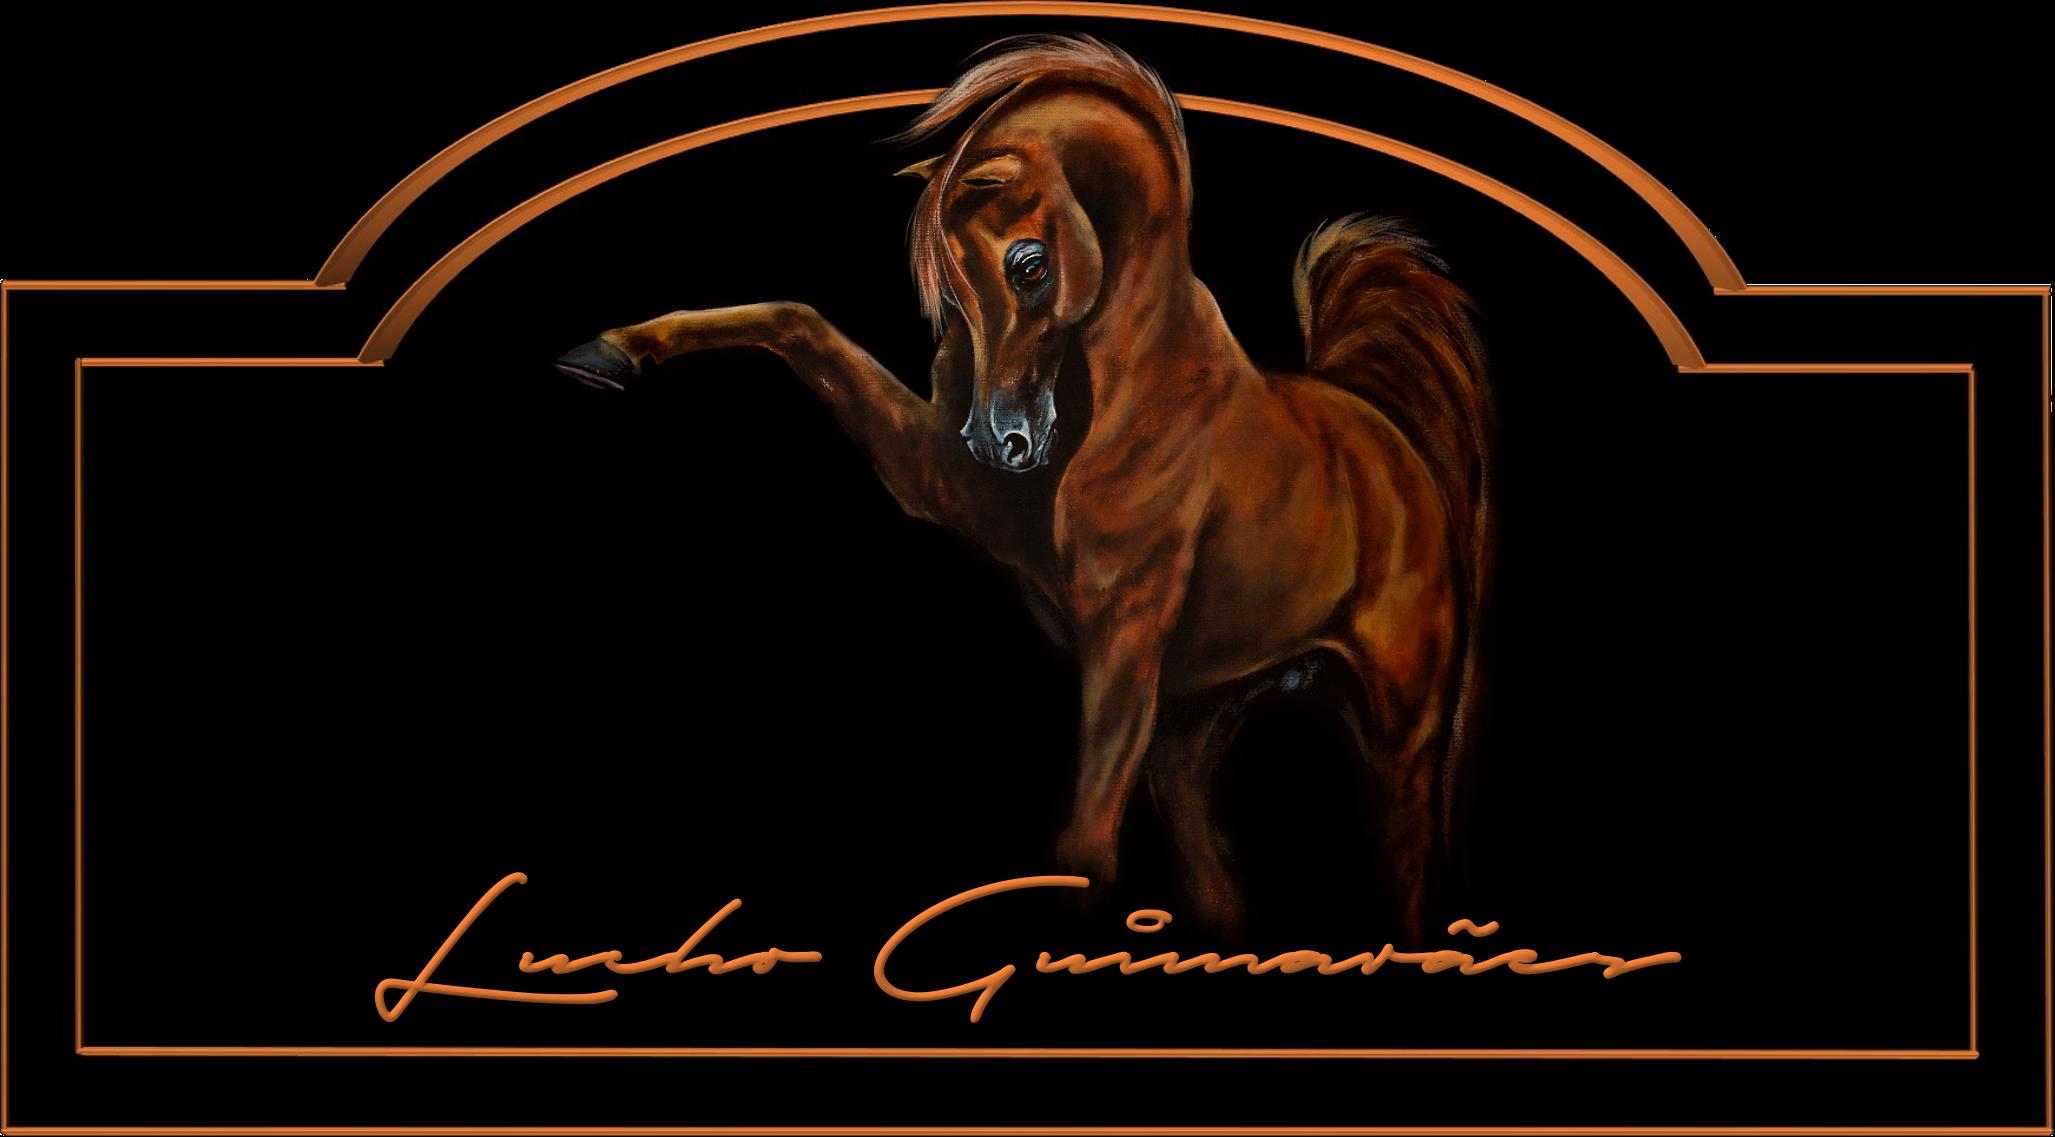 Lucho Guimaraes Arabians